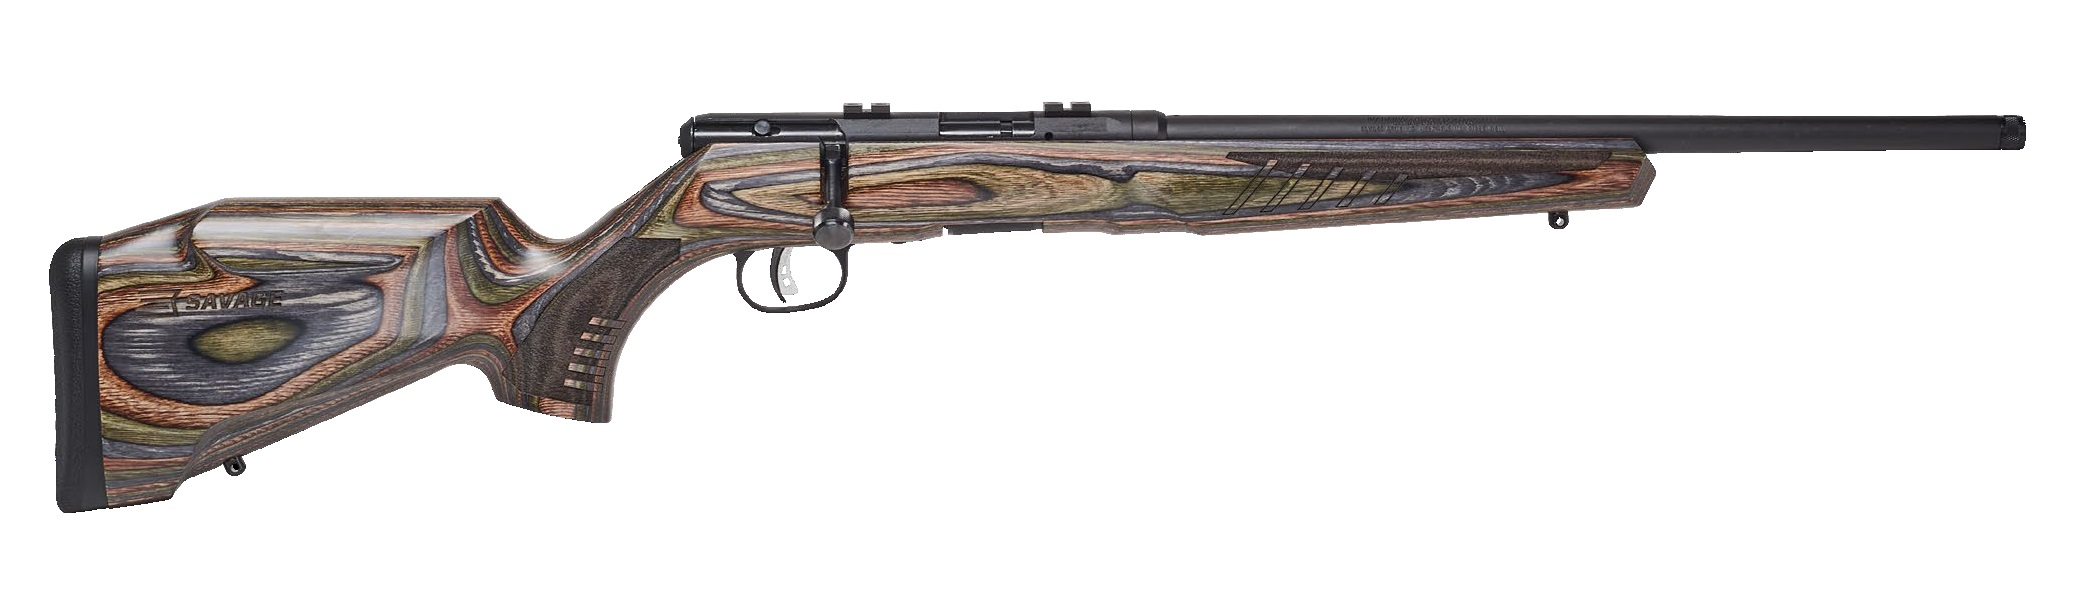 Savage Arms B17 BNS-SR 17 HMR